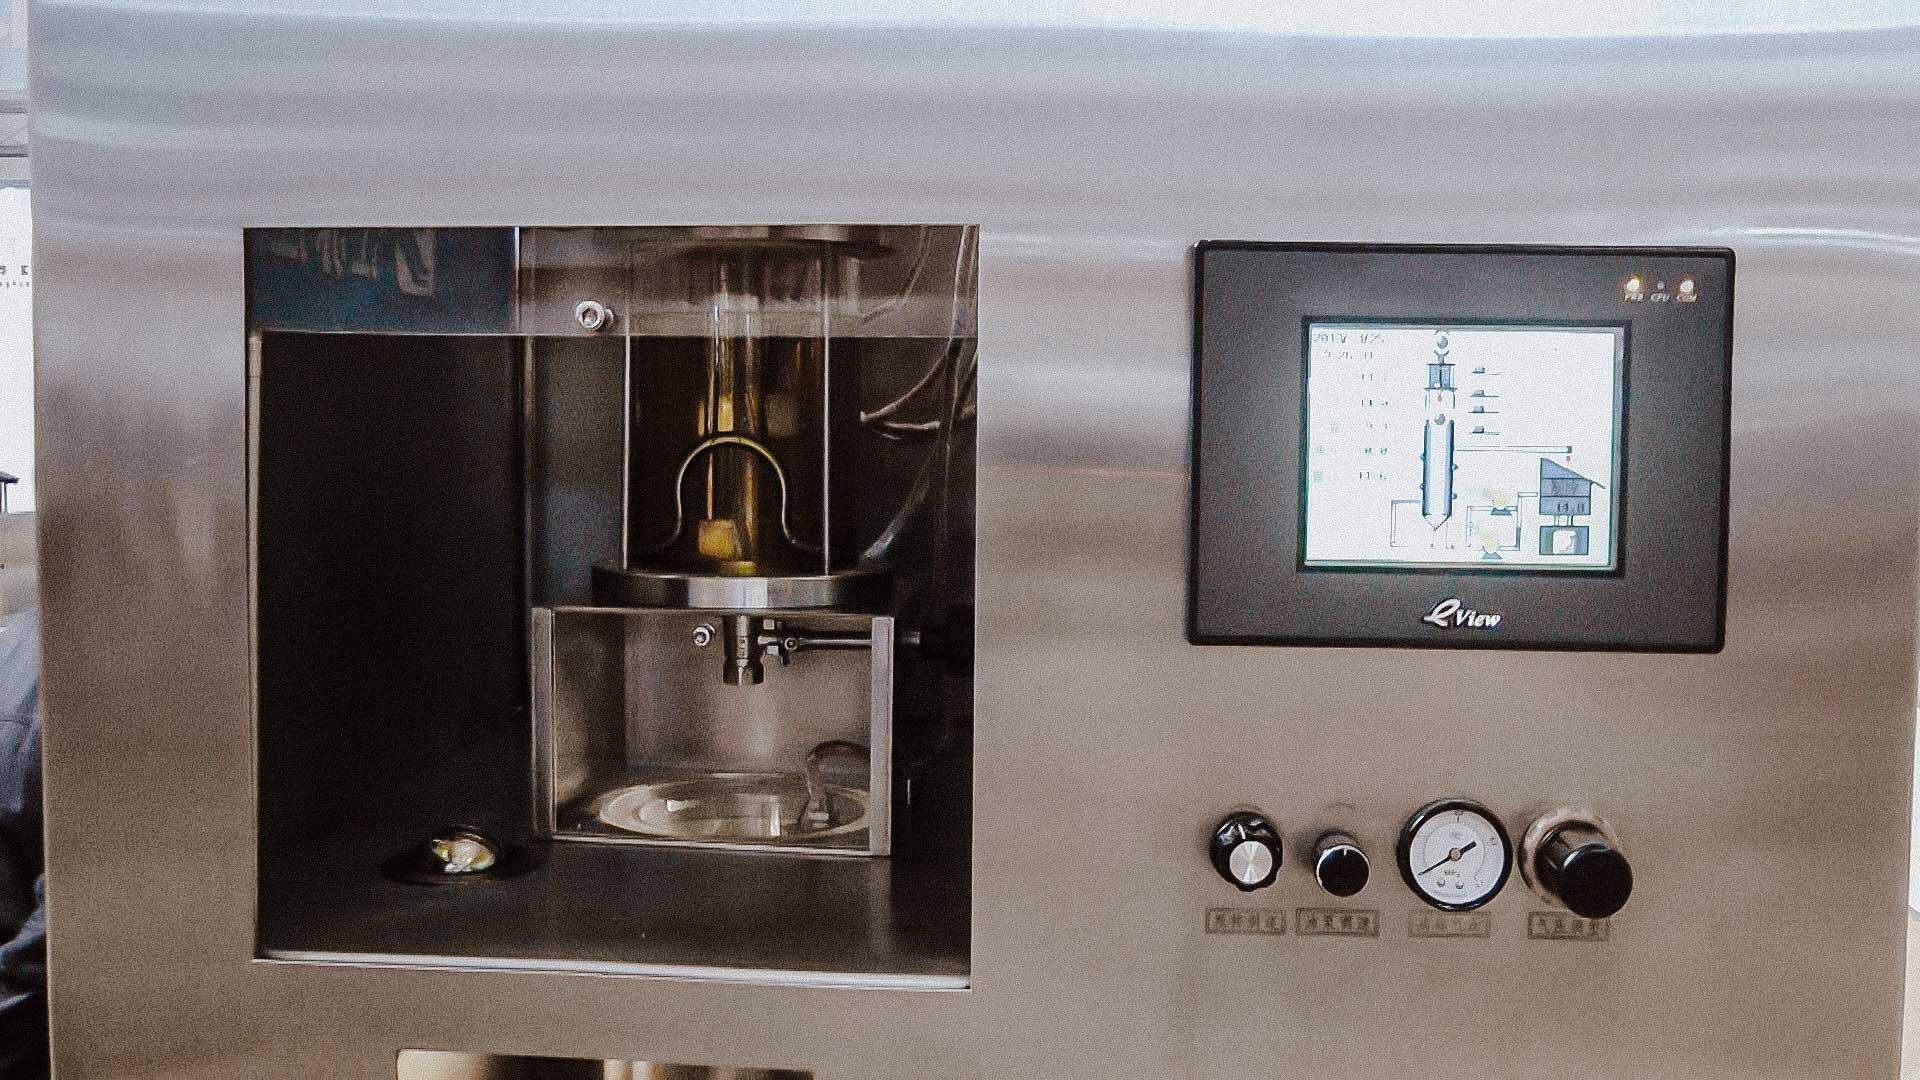 Equipment for oil capsule in soft gel capsule